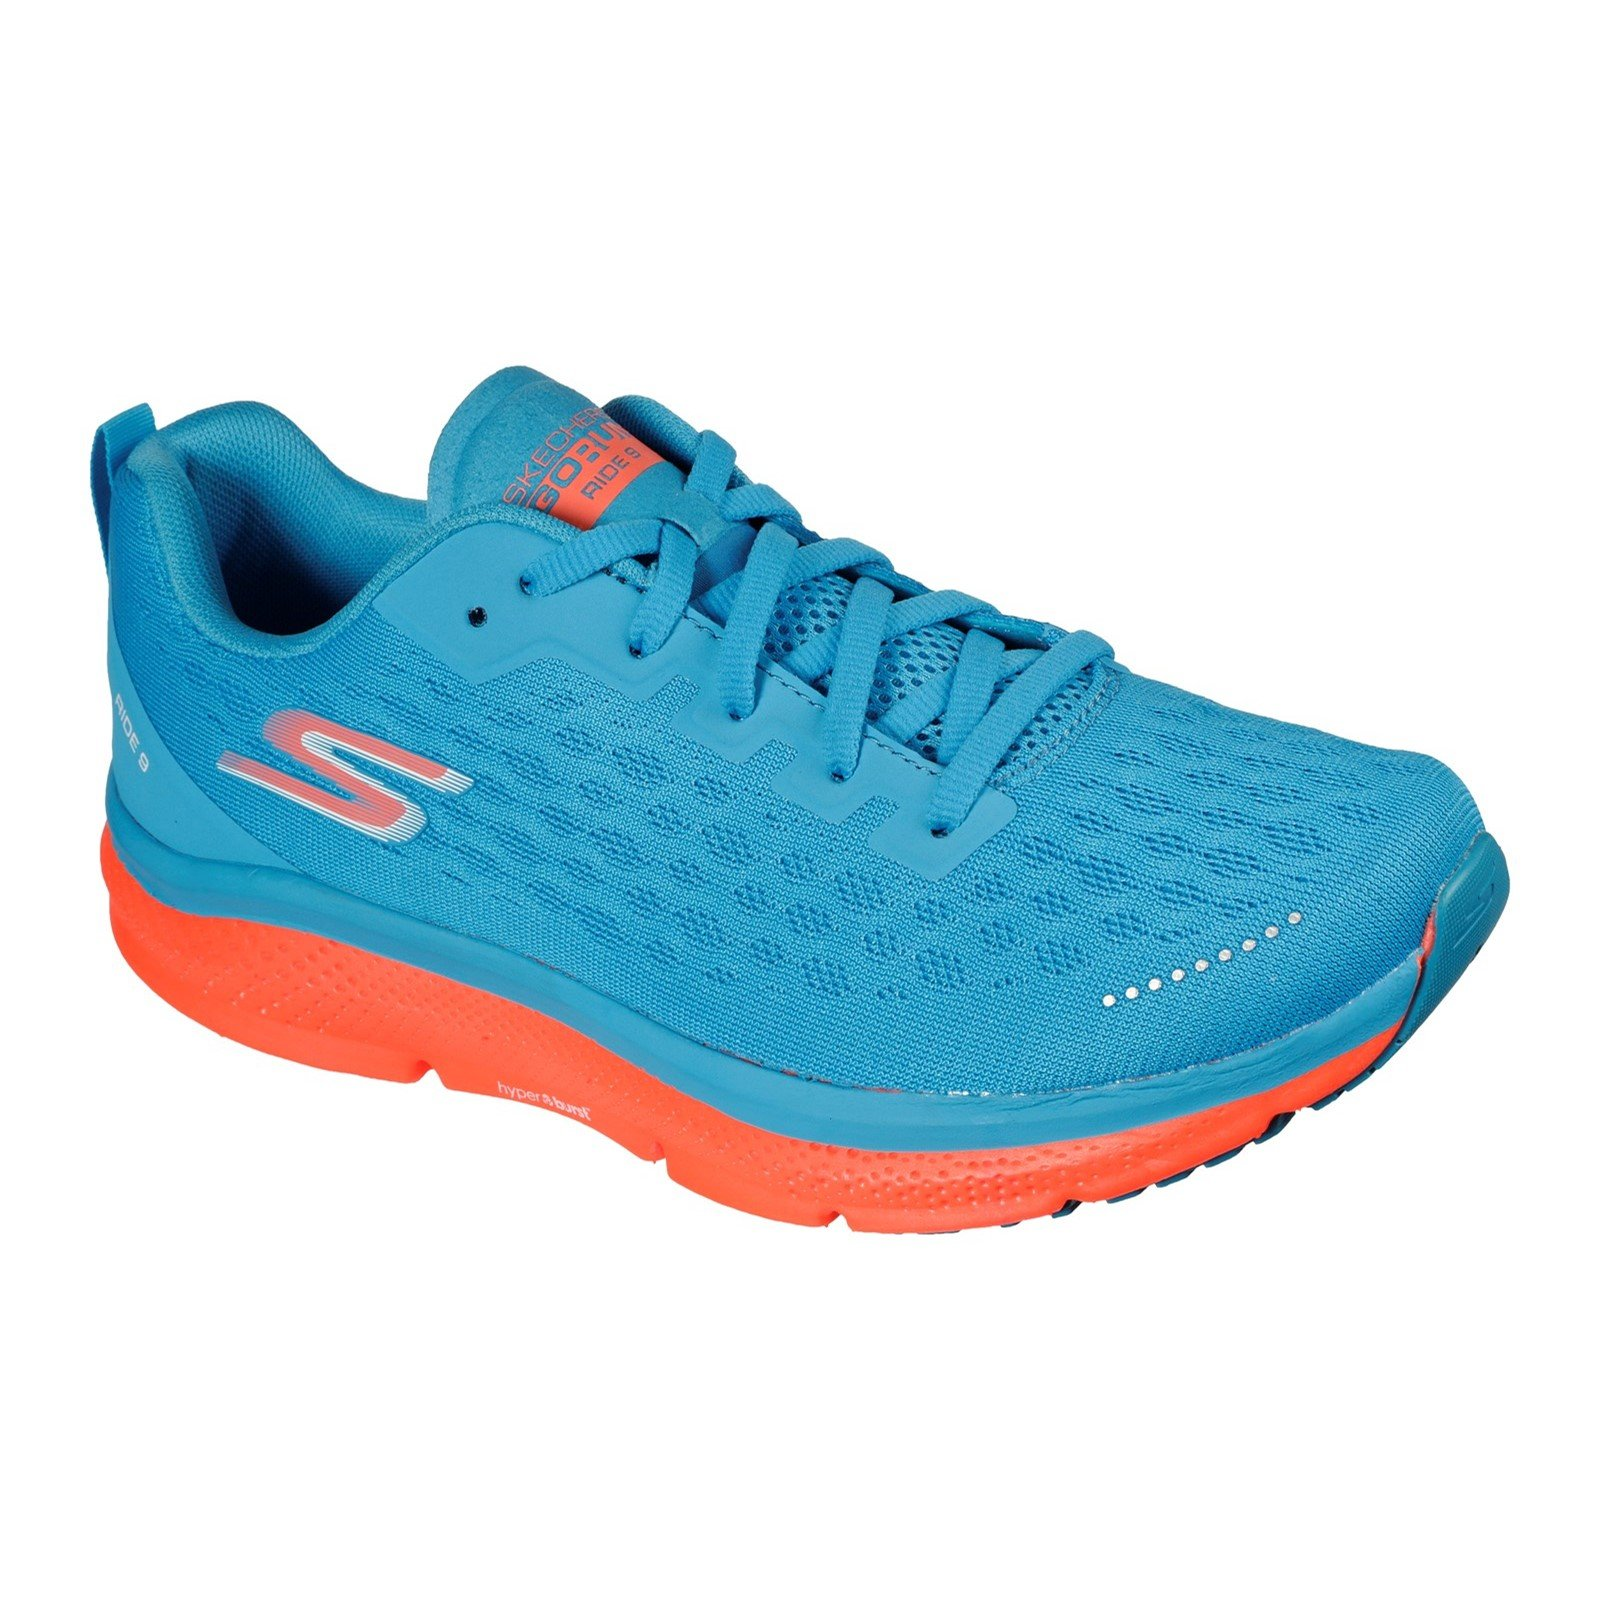 Skechers Men's Go Run Ride 9 Trainer Various Colours 32701 - Blue/Coral 11